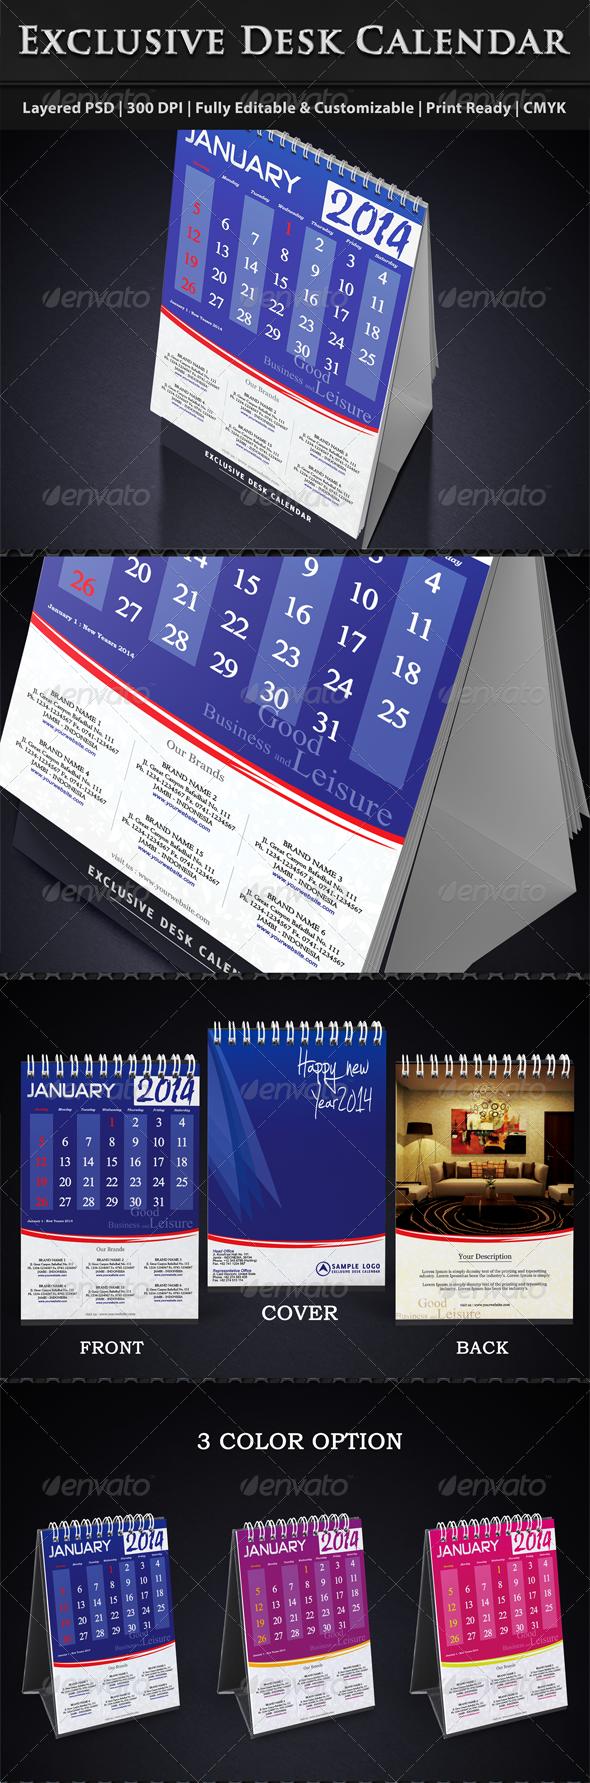 Exclusive Desk Calendar Template 2014 - Calendars Stationery